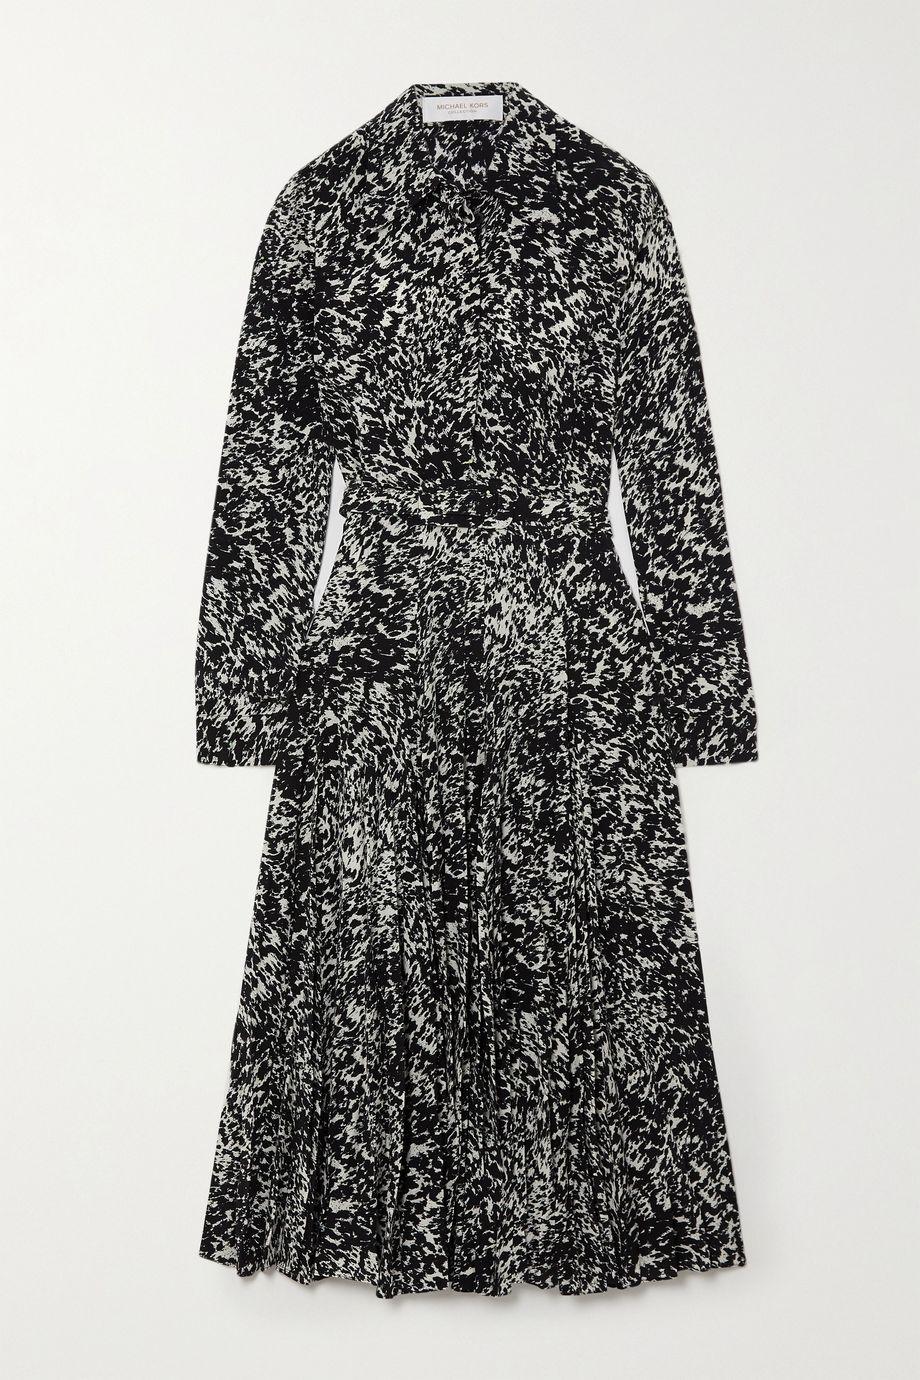 Michael Kors Collection Midi-Hemdblusenkleid aus bedrucktem Crêpe de Chine aus Seide mit Gürtel